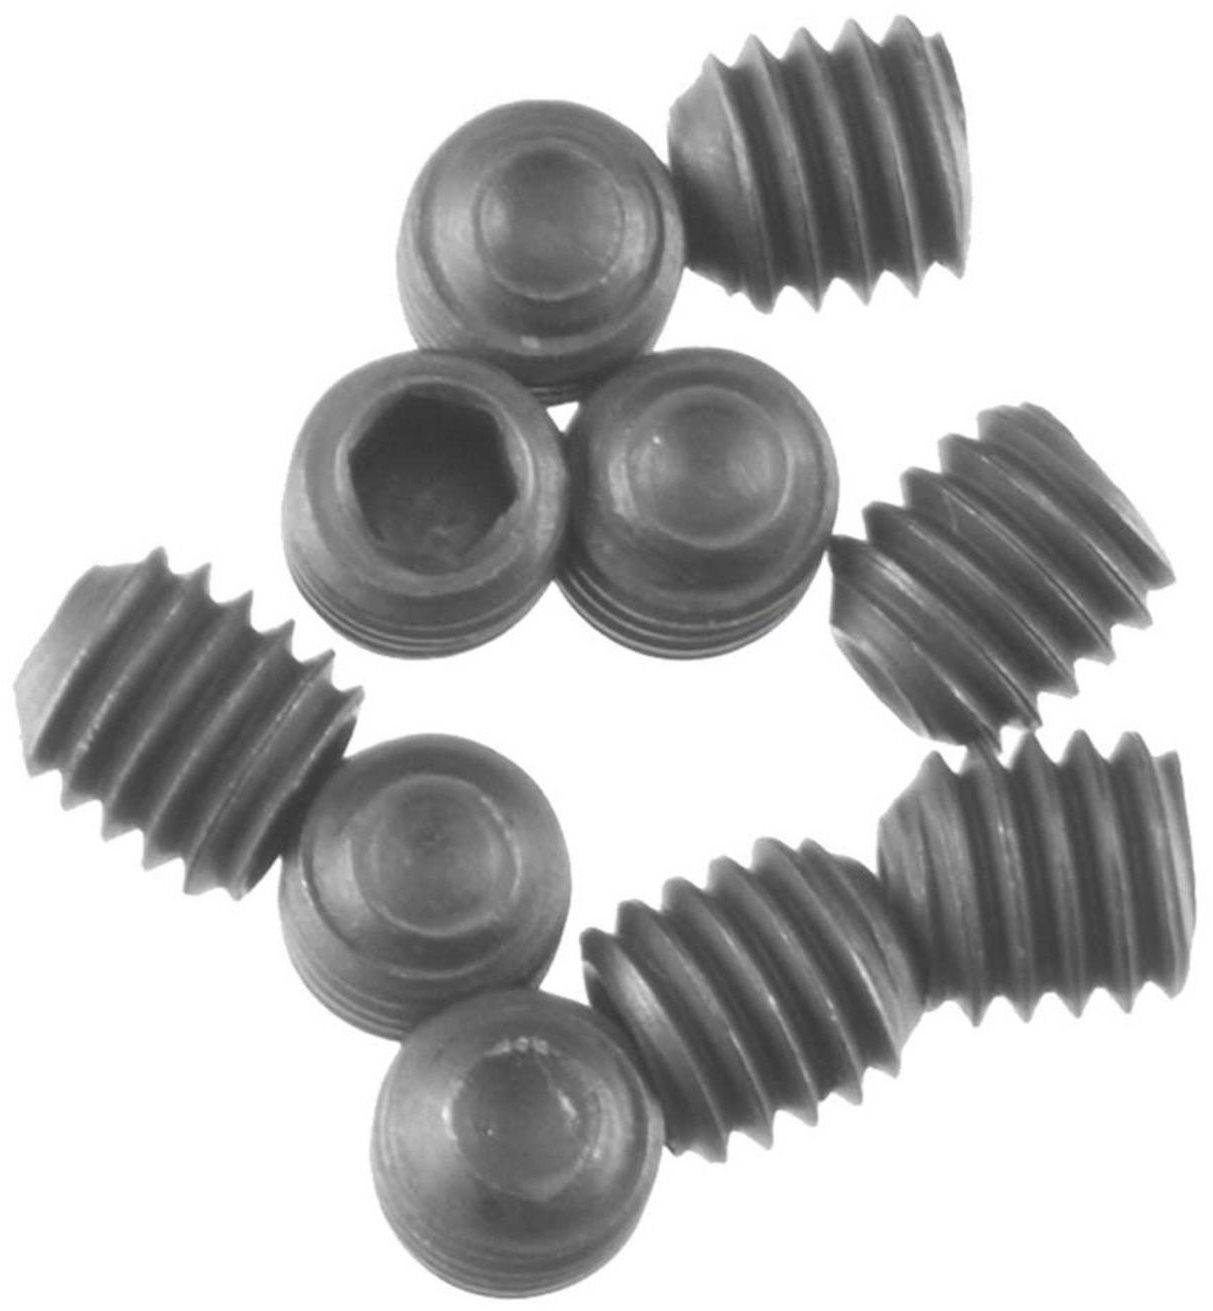 Axial Set Screw M3x3mm Black Oxide (10)